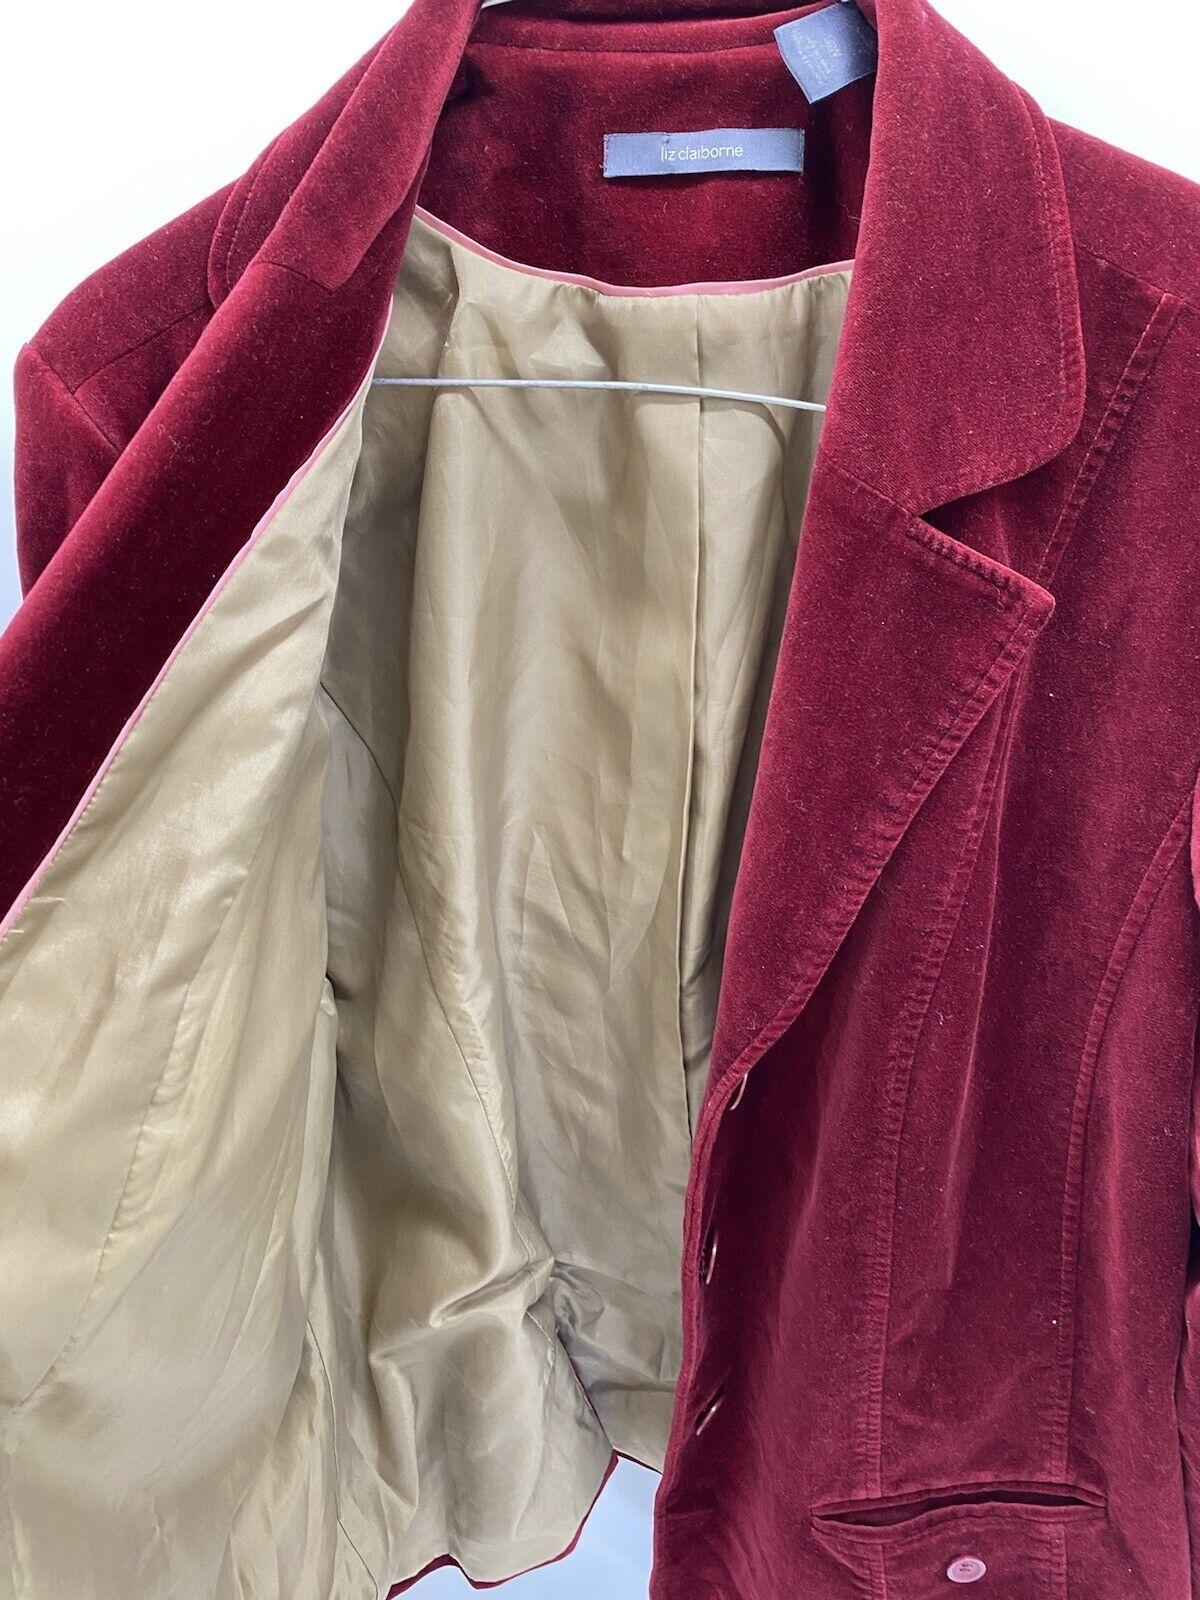 Liz Claiborne Red suede lined jacket/blazer Mediu… - image 3